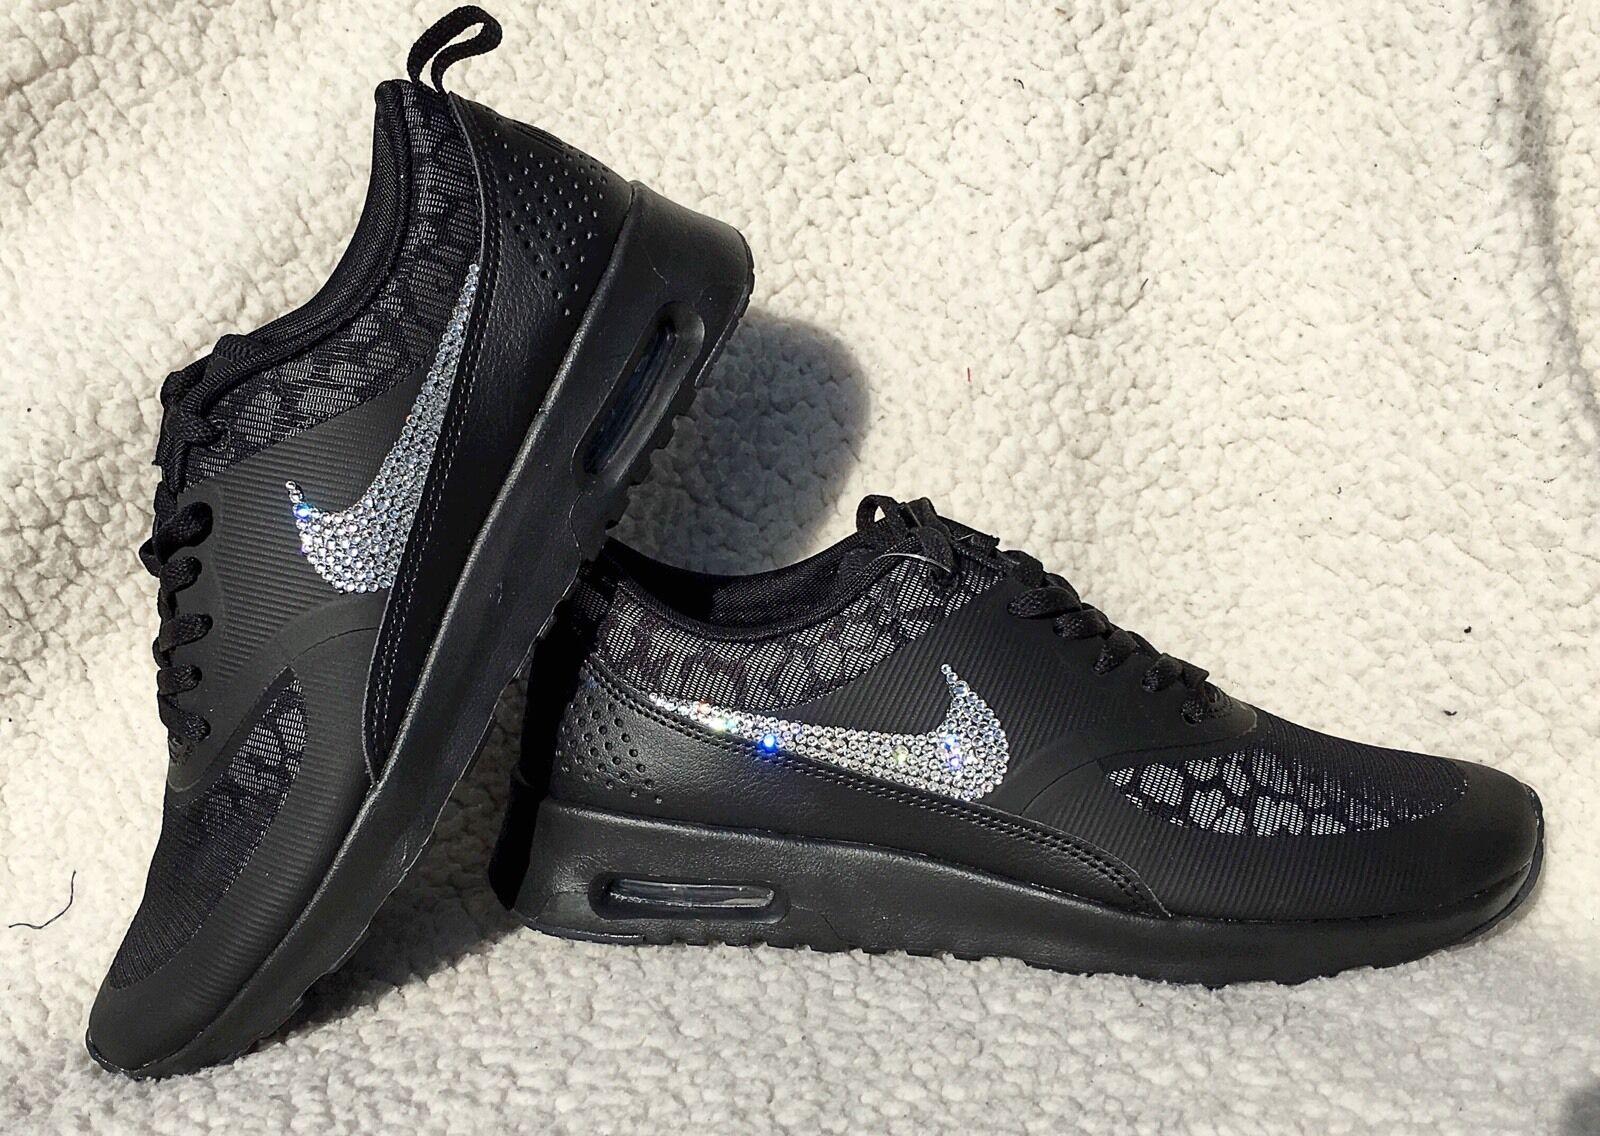 Nike Air Max Thea Black Cheetah Leopard Print Print Print W Swarovski Crystals Bling d4016a